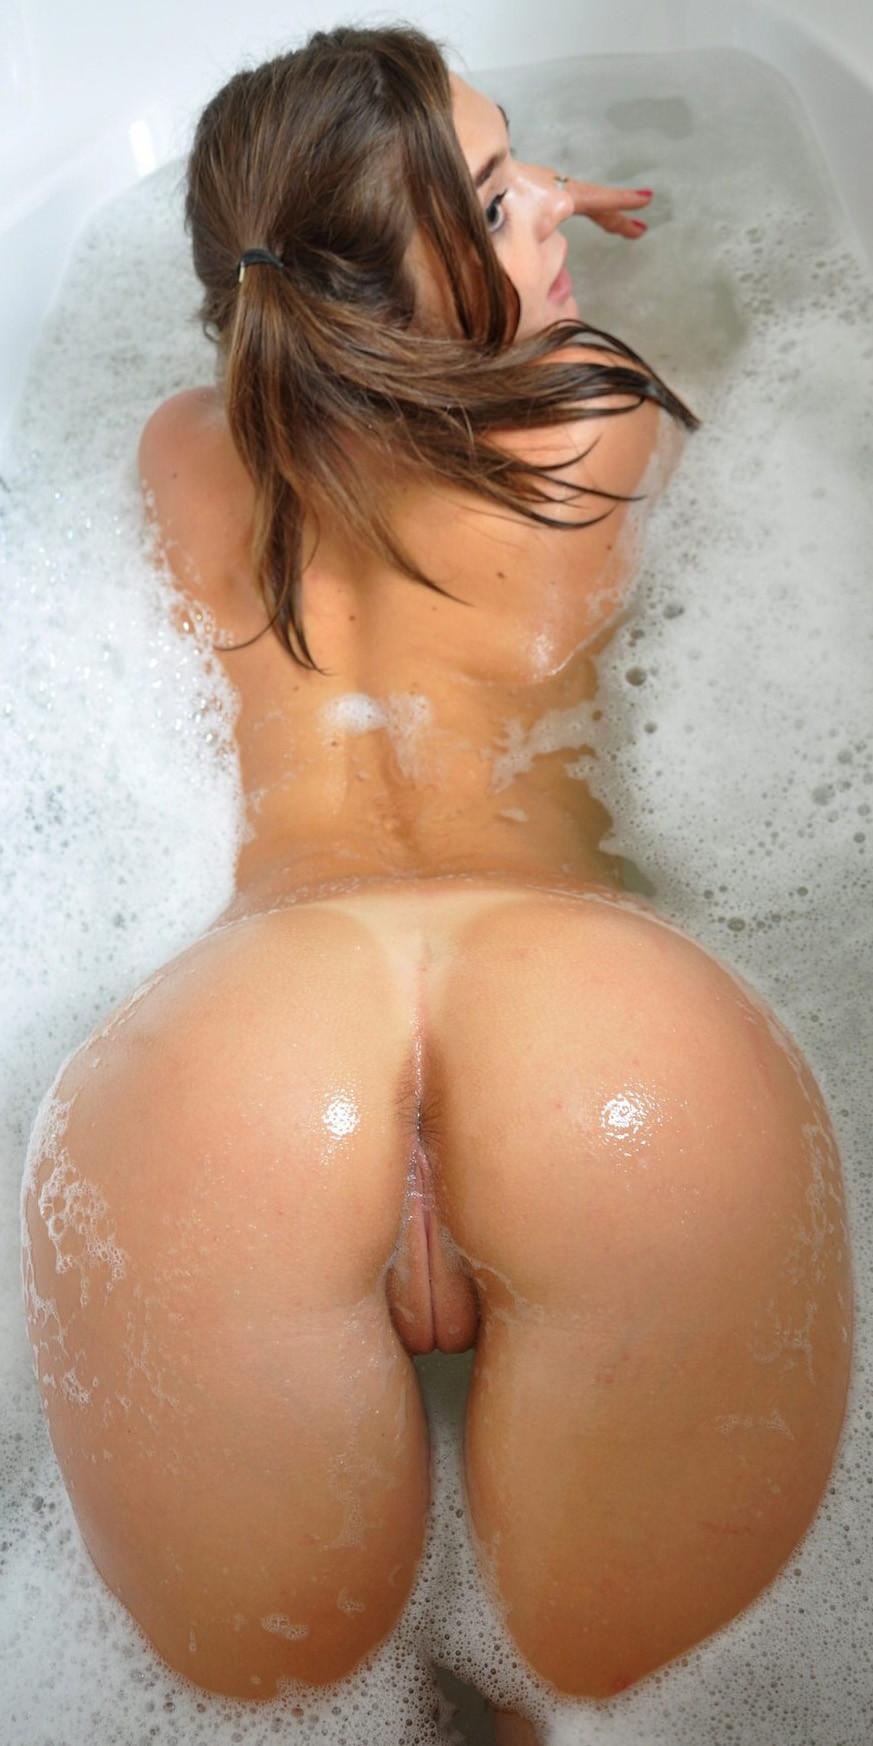 Sophie dee nude pics